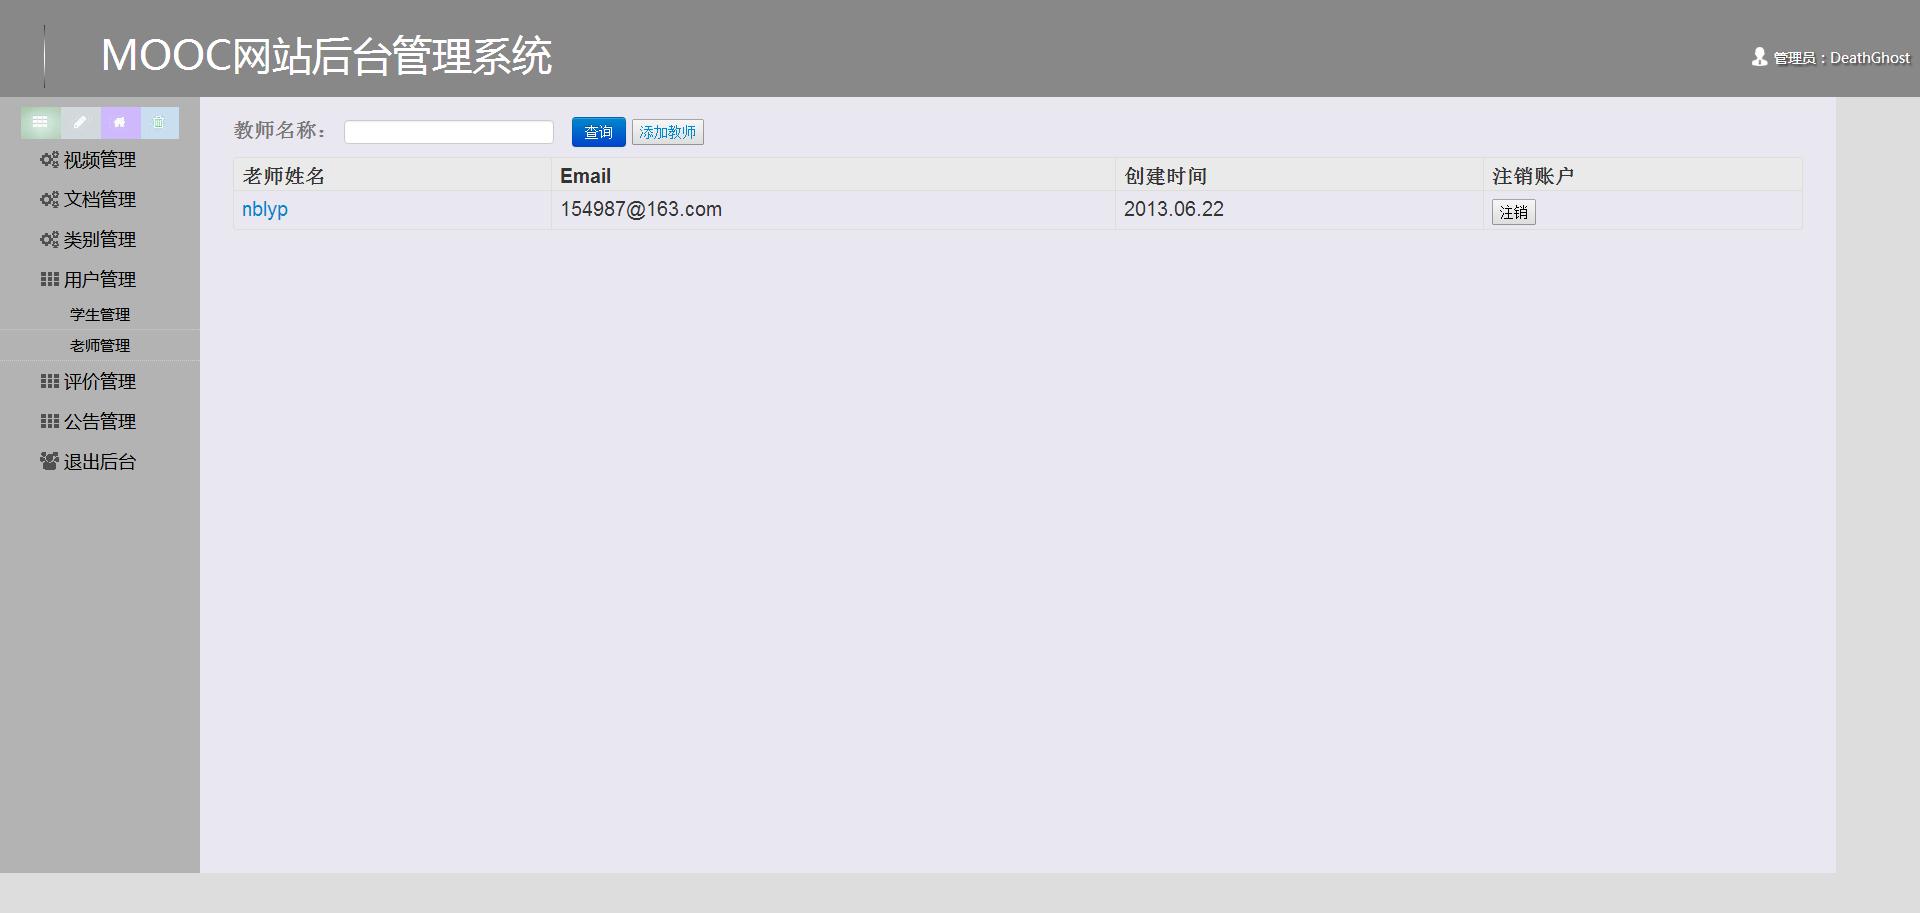 MOOC简约后台管理界面模板